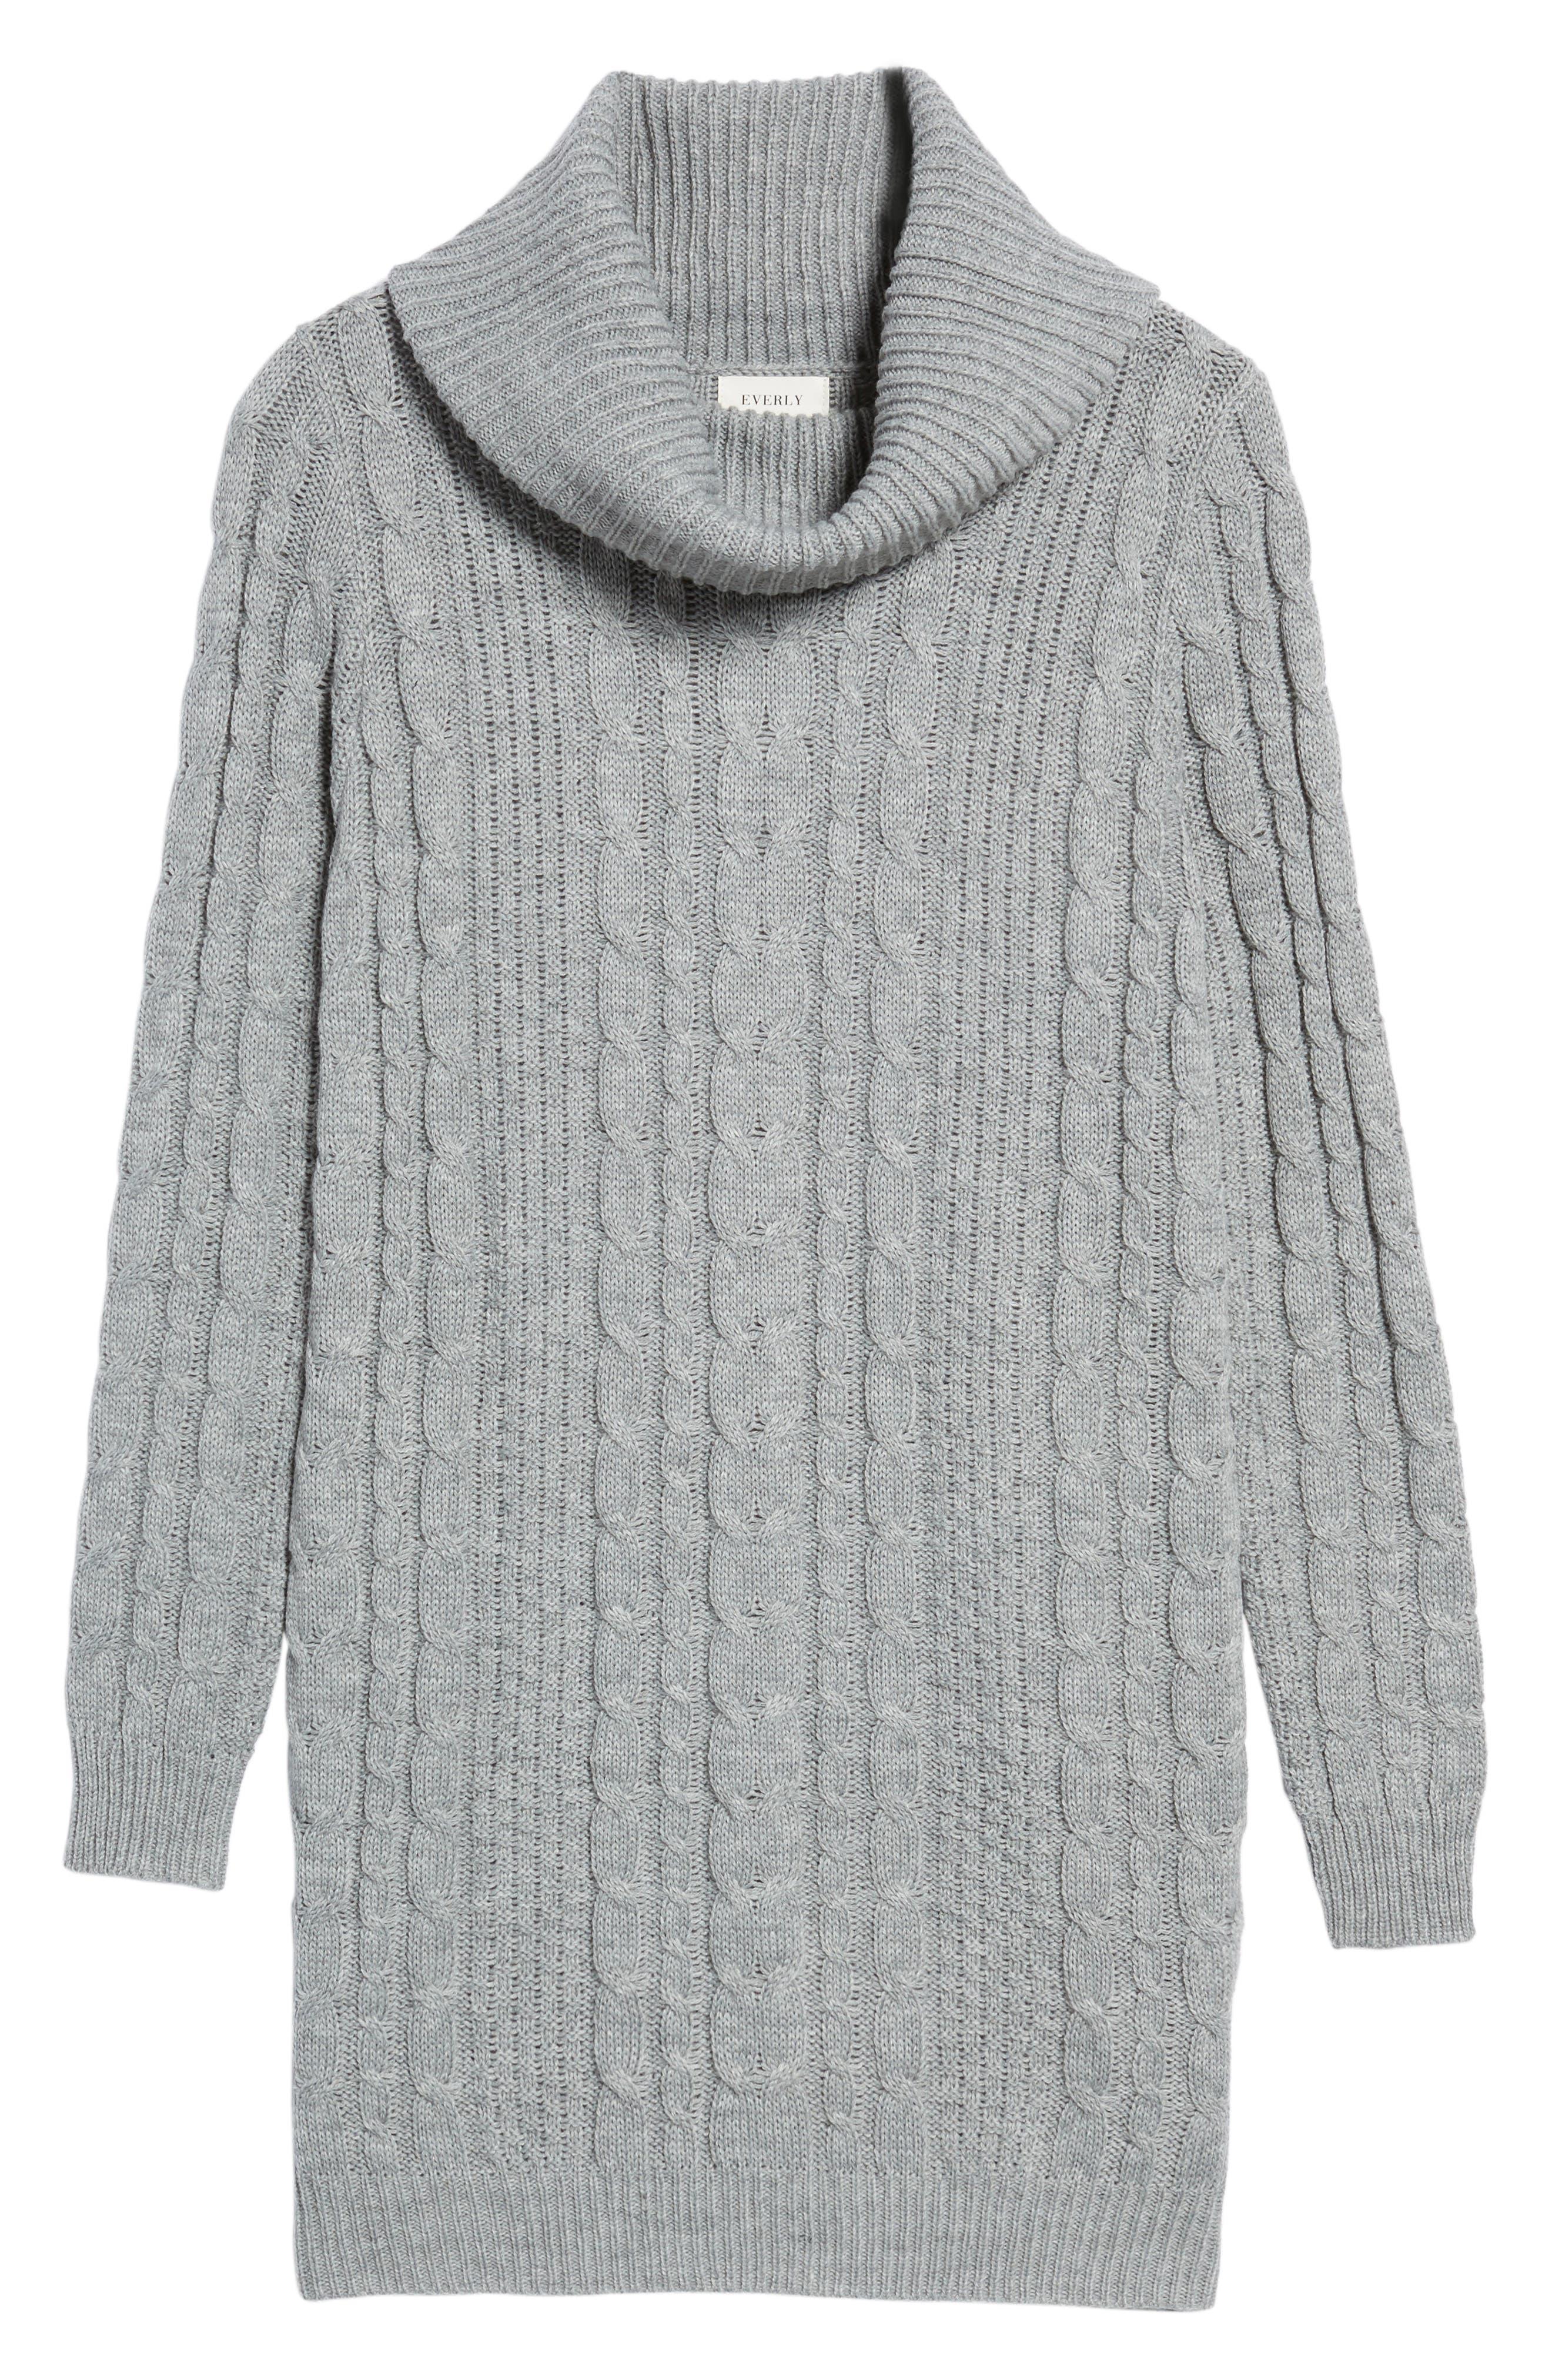 Cowl Neck Sweater Dress,                             Alternate thumbnail 6, color,                             020